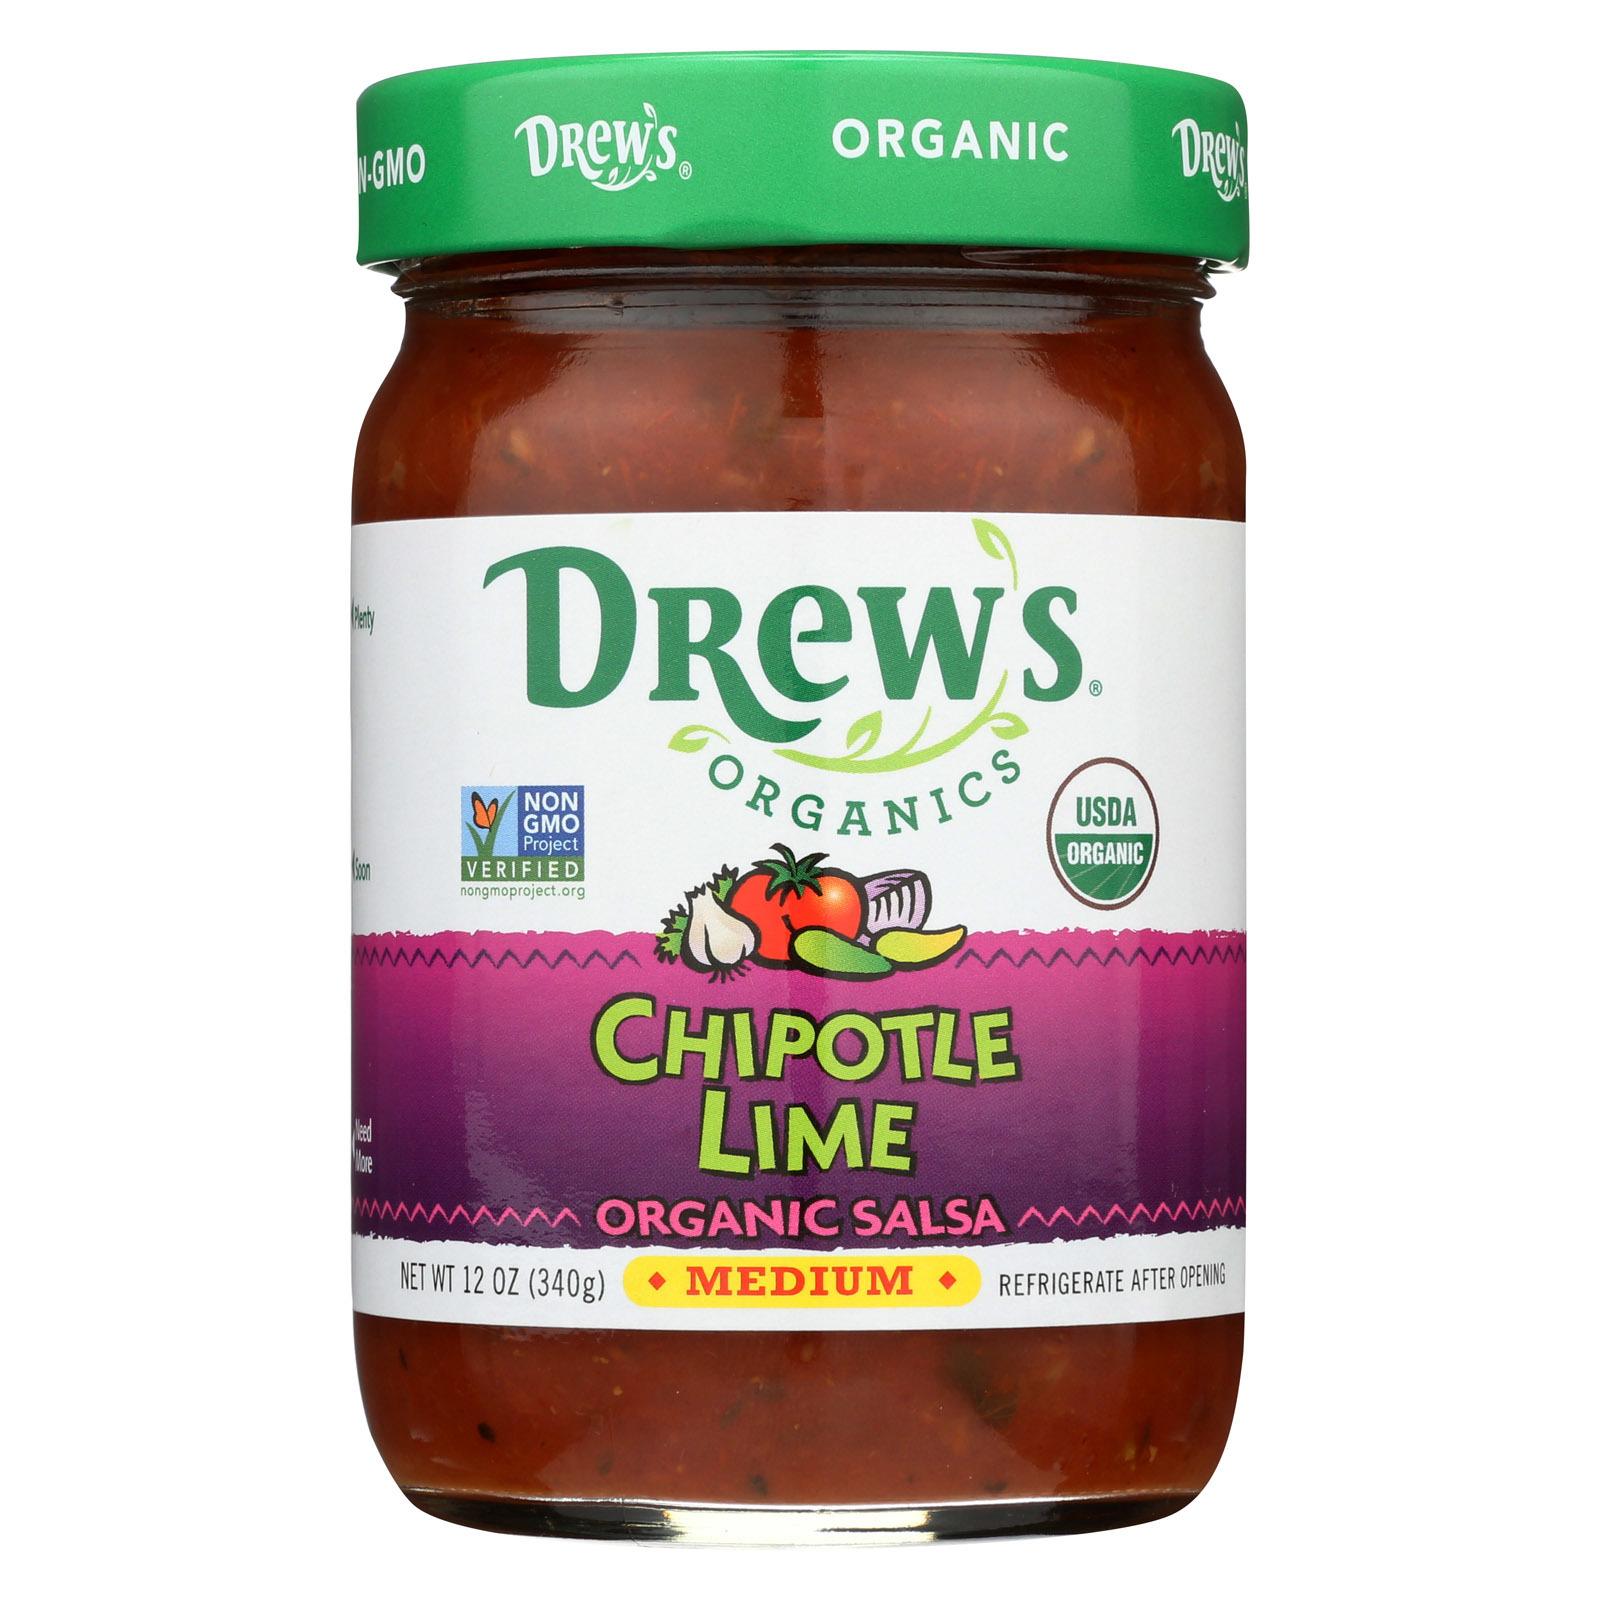 Drew's Organics Chipotle Lime Salsa - 12 Oz. - Case of 6